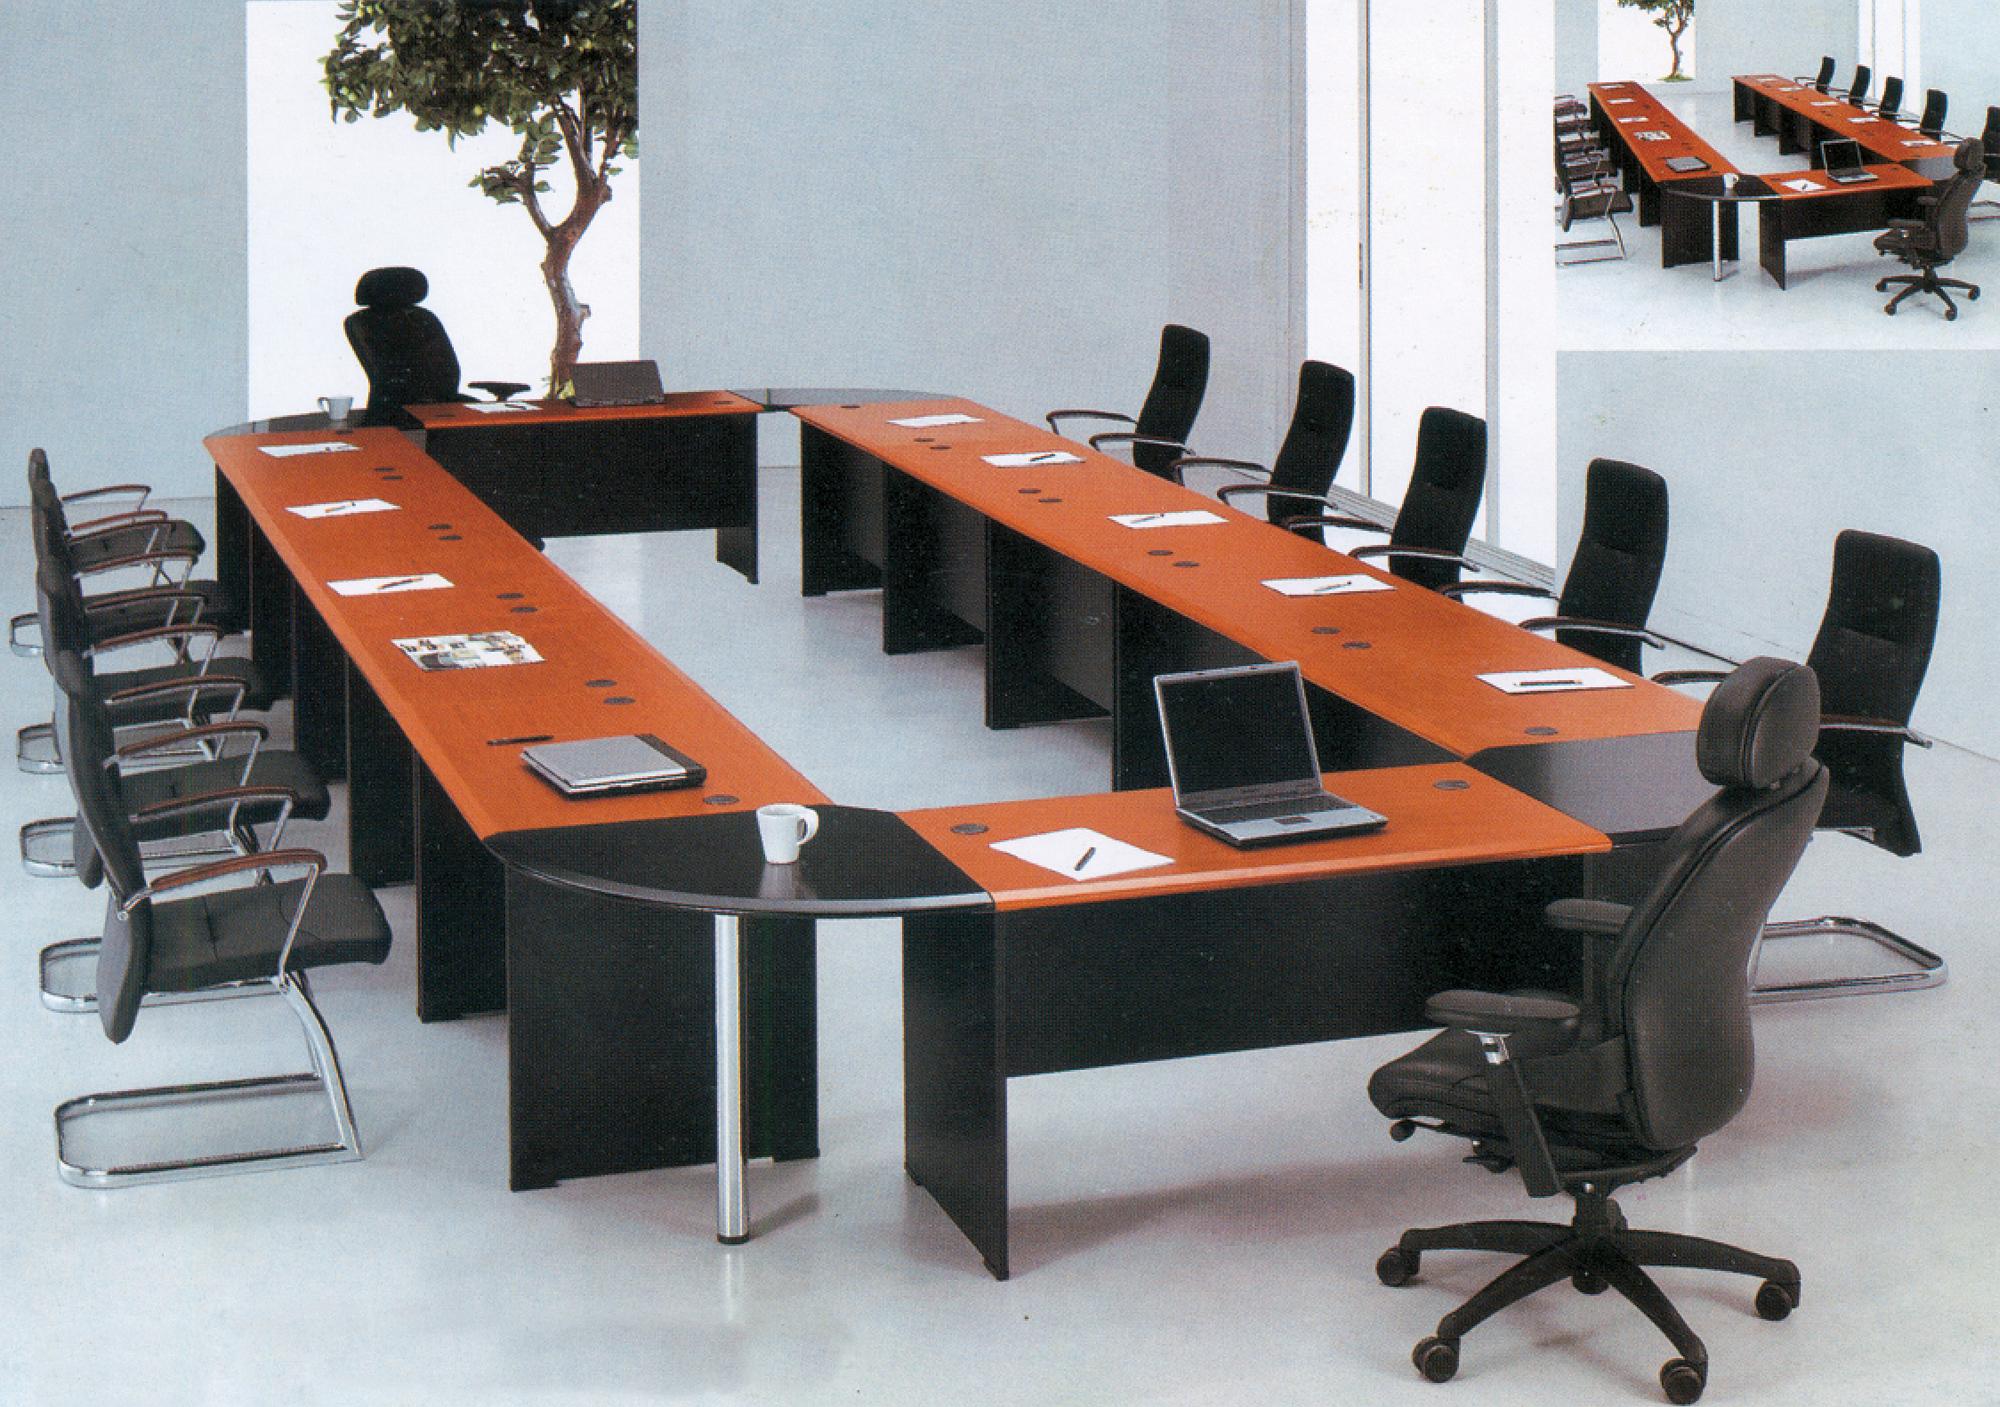 selangor fc table